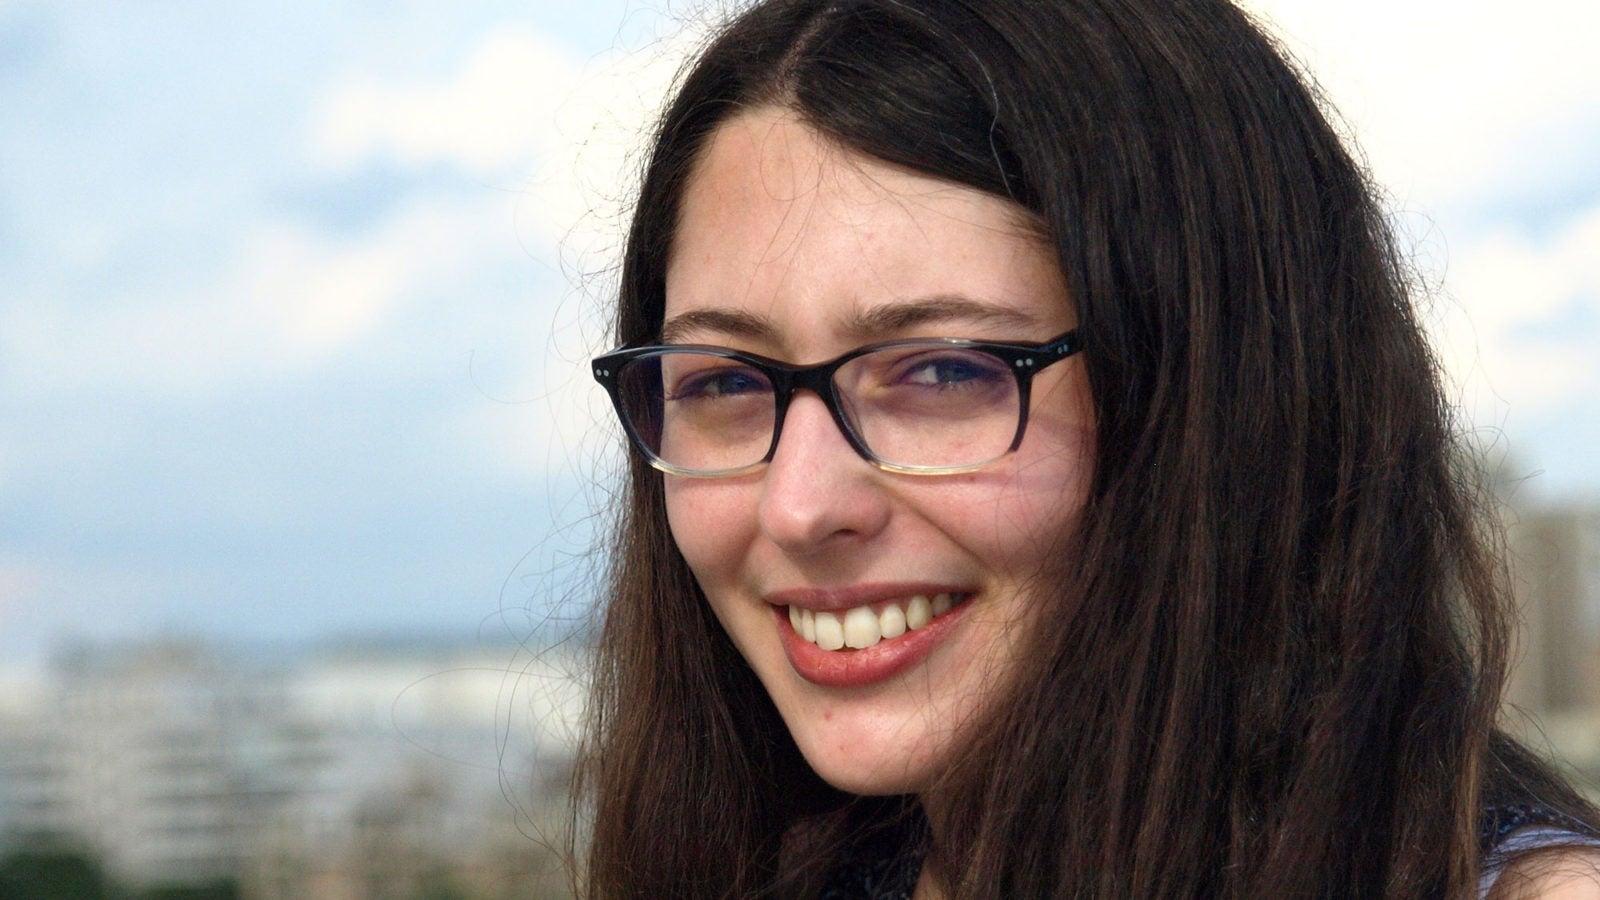 Rachel Linton